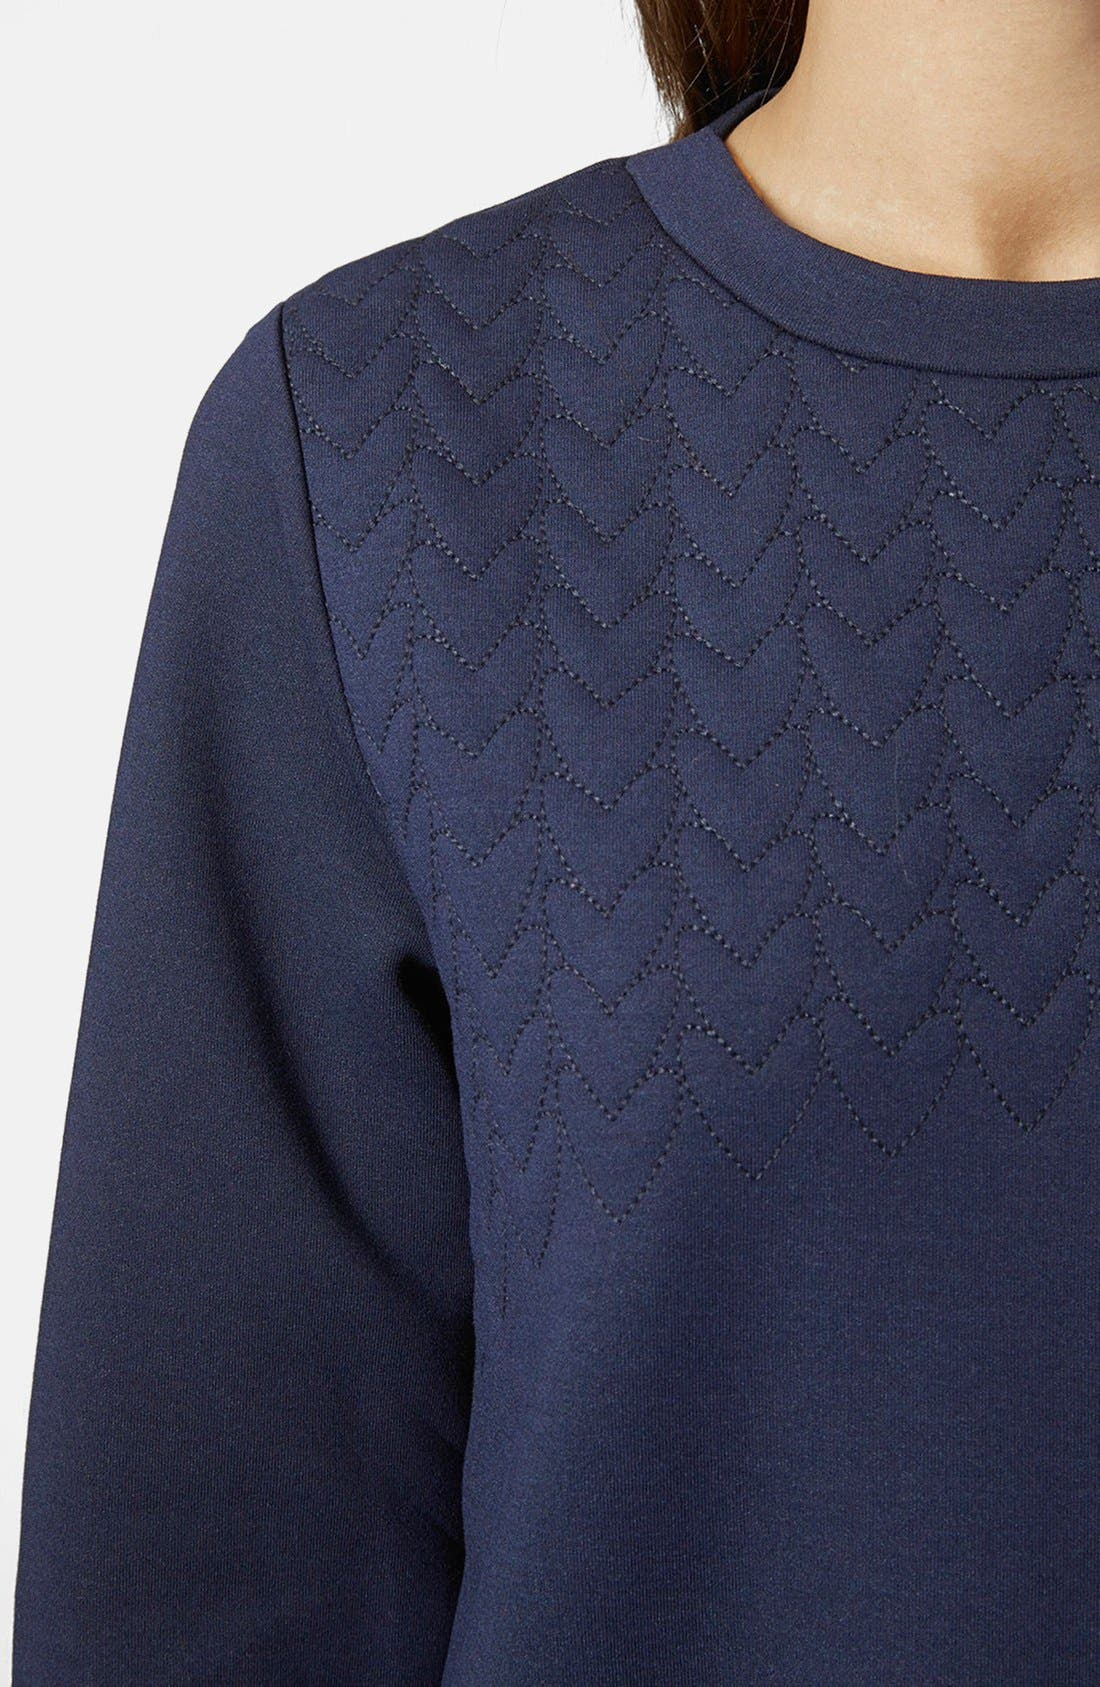 Alternate Image 4  - Topshop Quilted Sweatshirt Dress